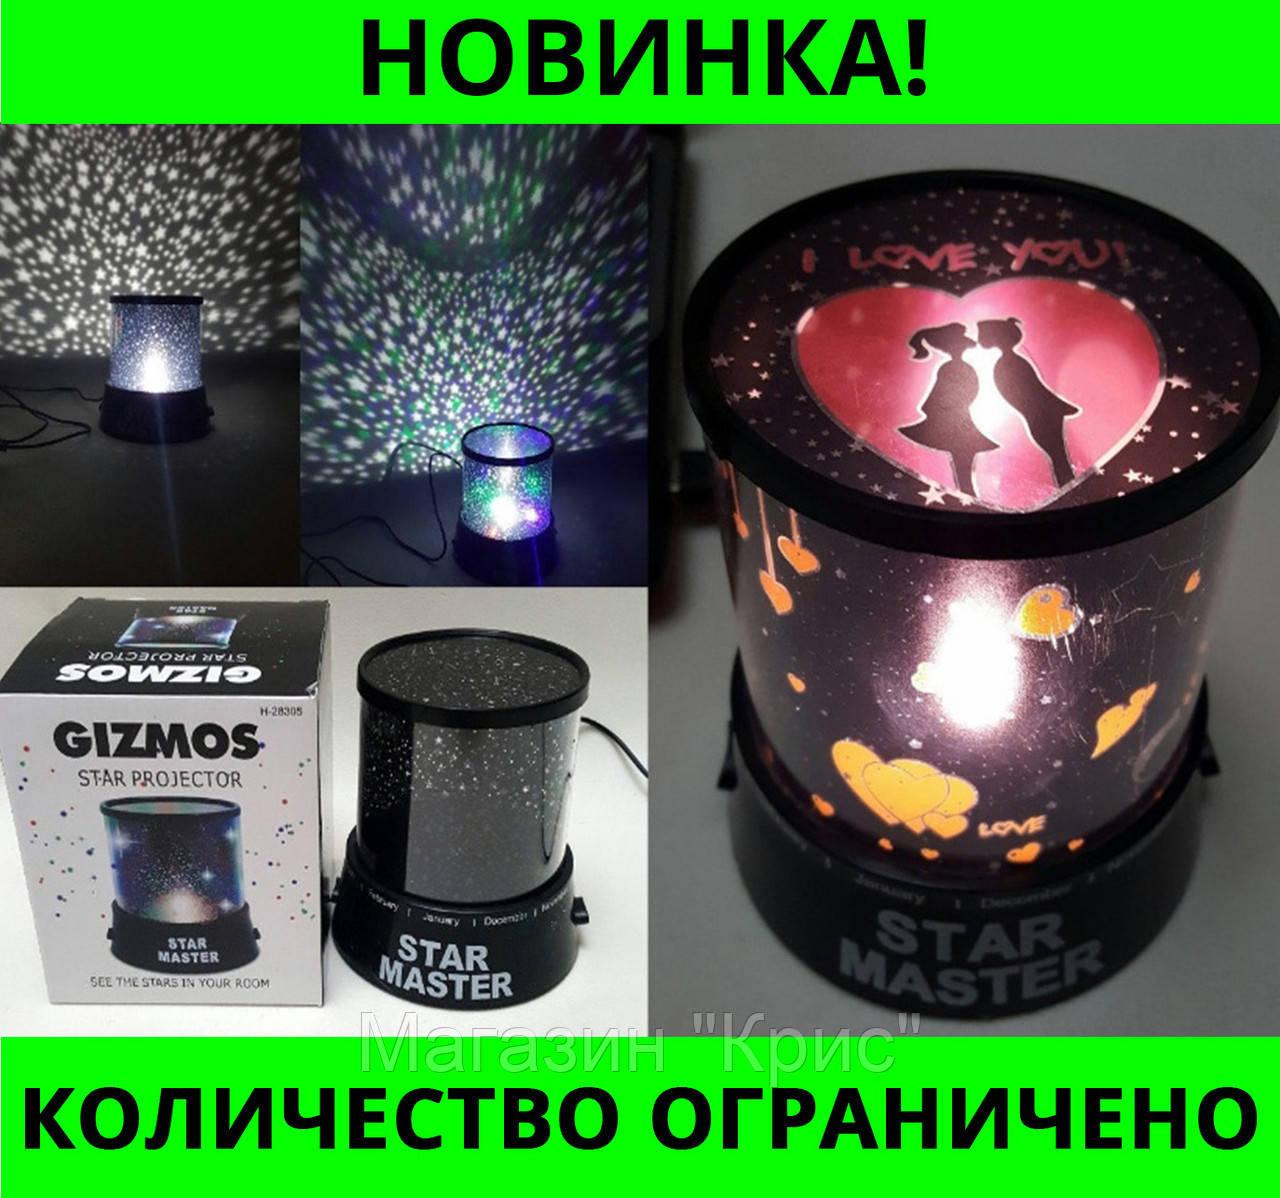 Ночник STAR MASTER H-28305 with Adapter! Распродажа